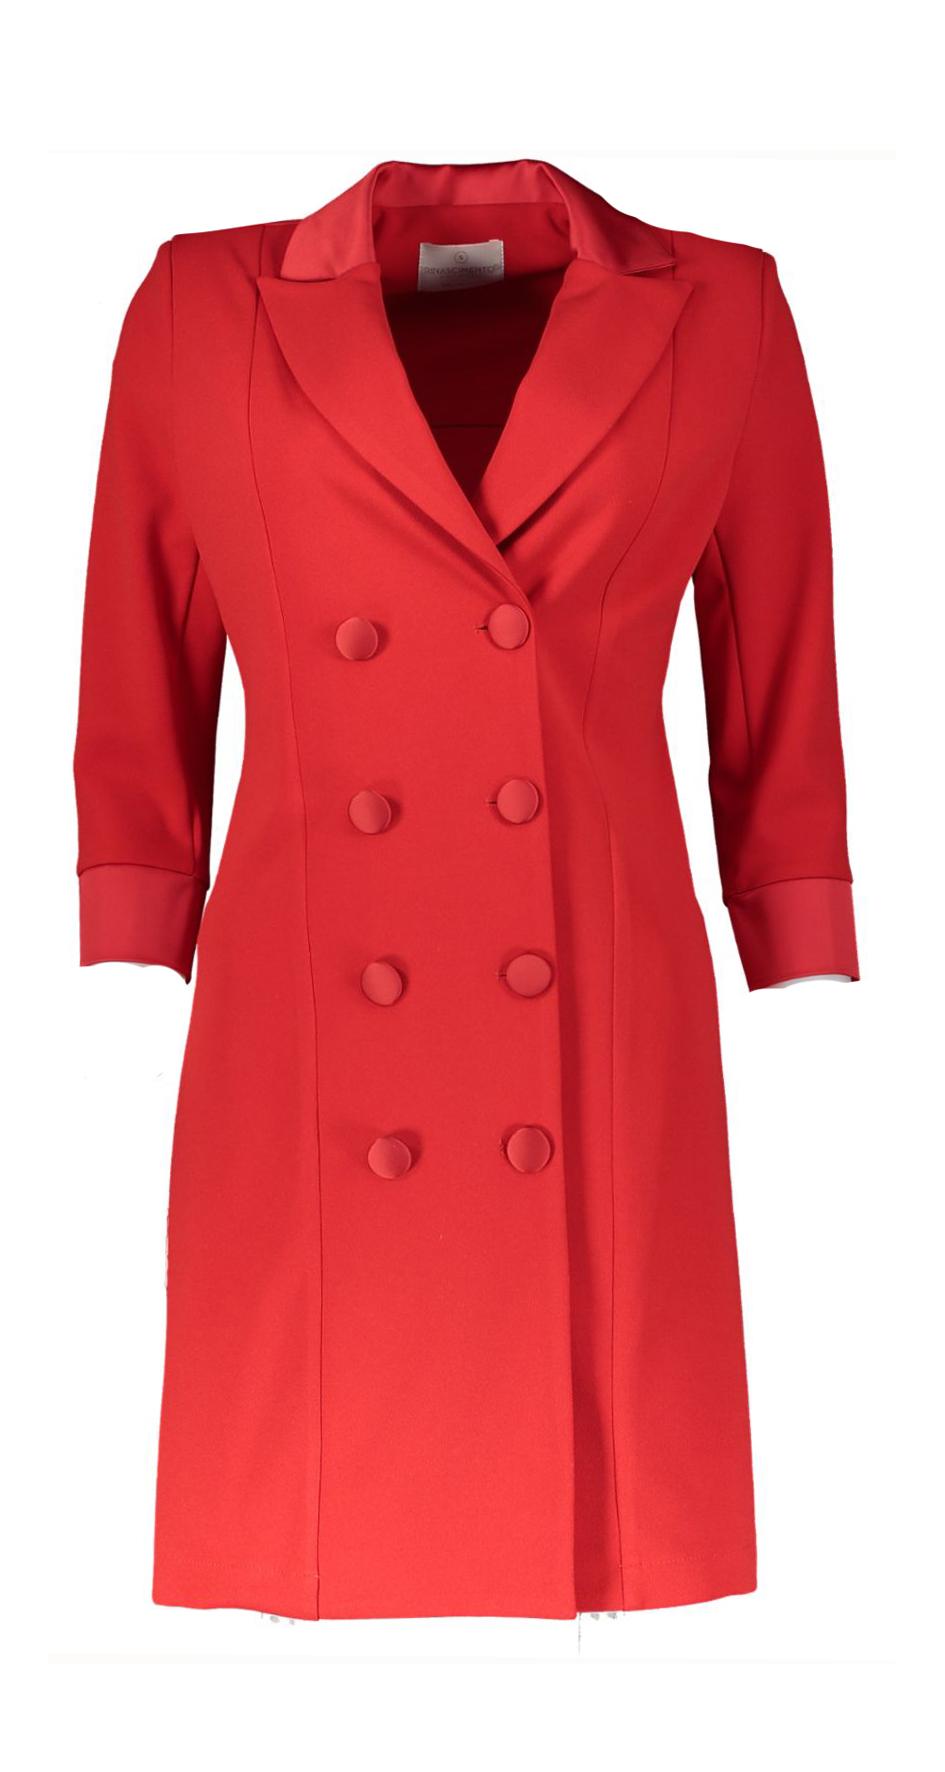 smok dress red _Front_M1500x15000JPG